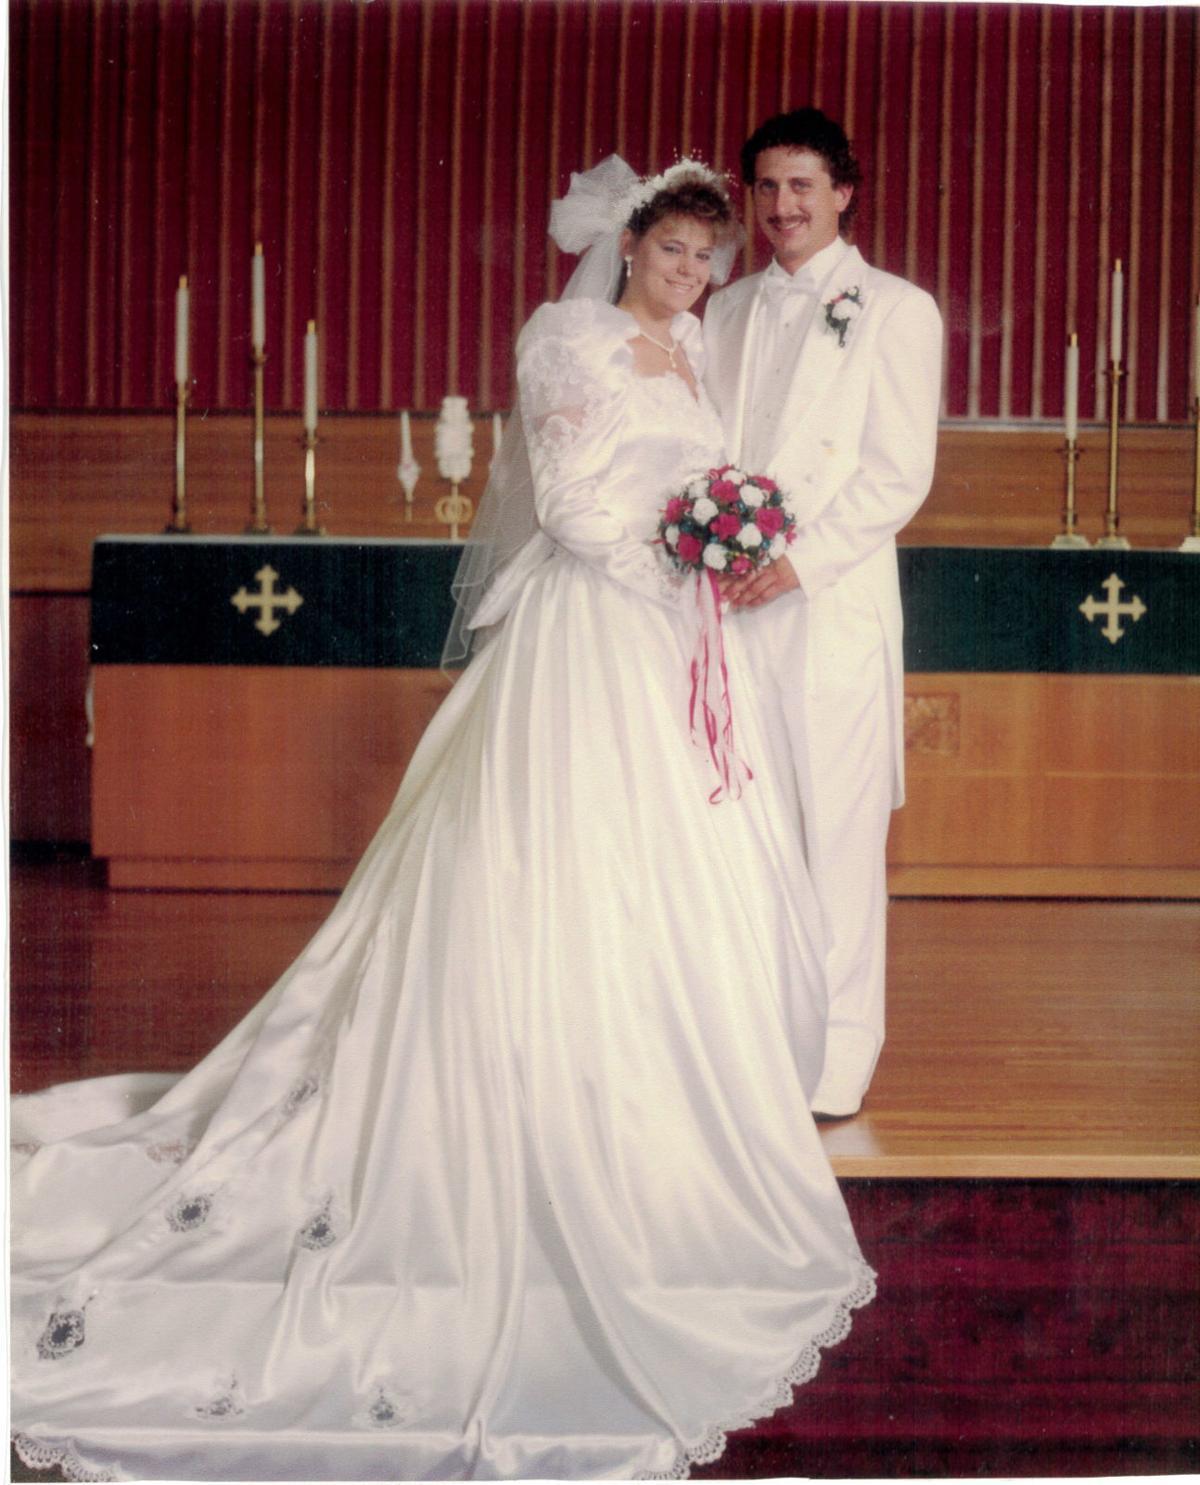 Craig and Donna Schultze then